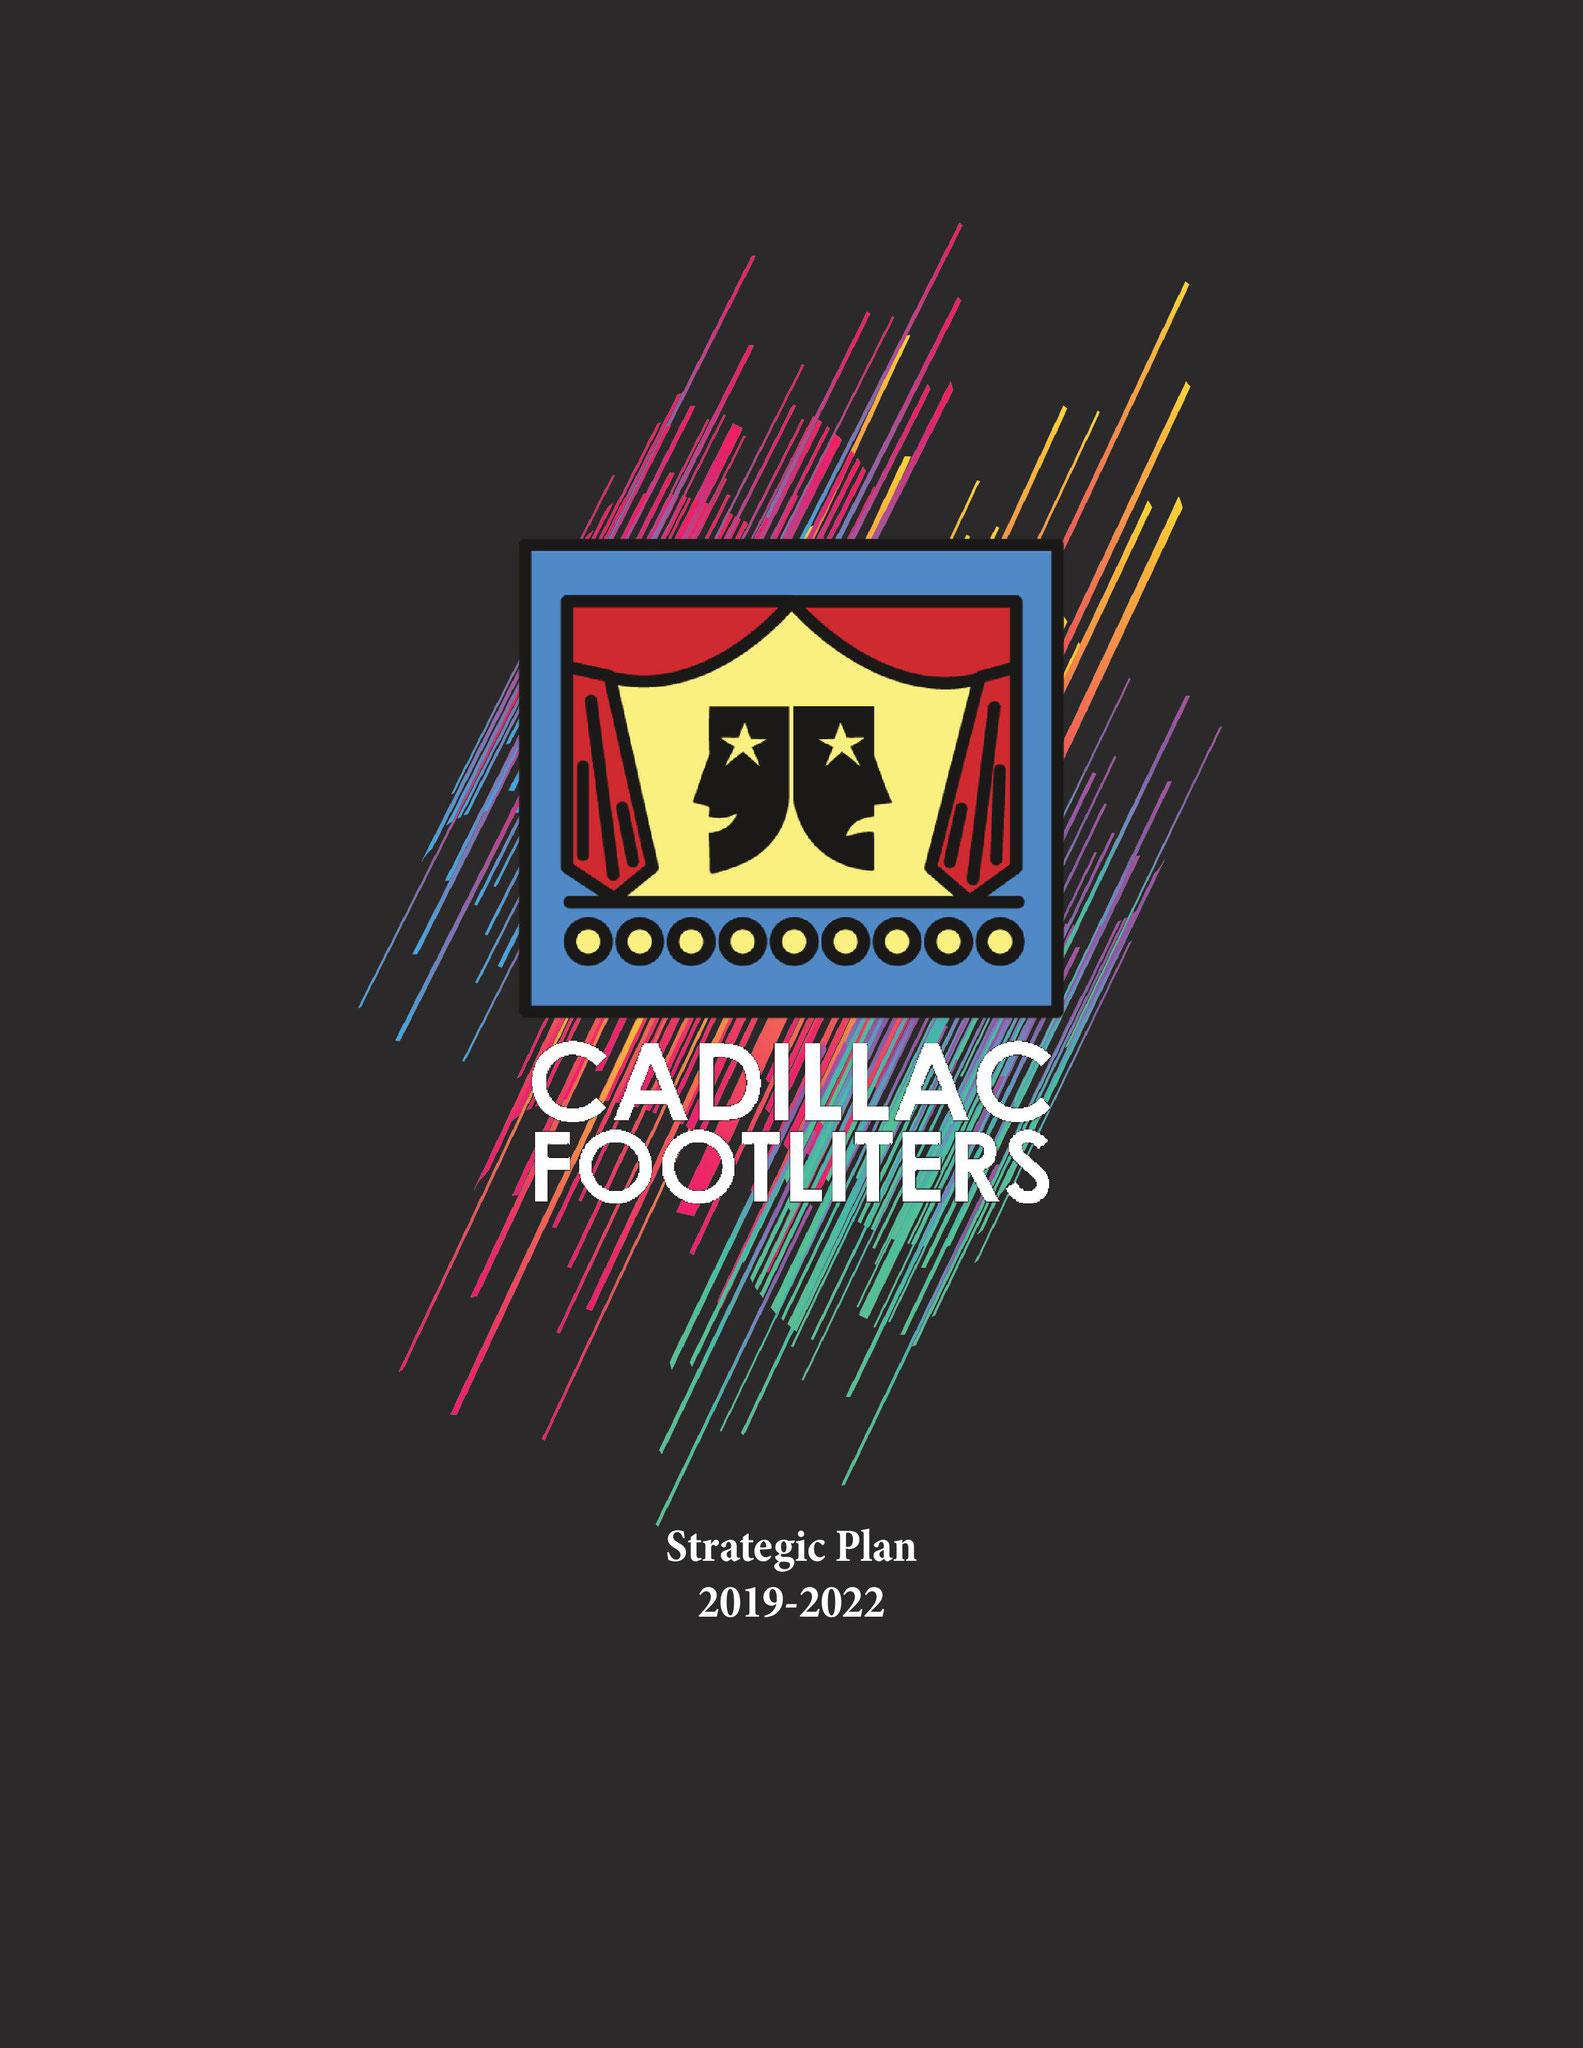 Cadillac Evening News >> Cadillac Footliters News Cadillac Footliters Community Theater